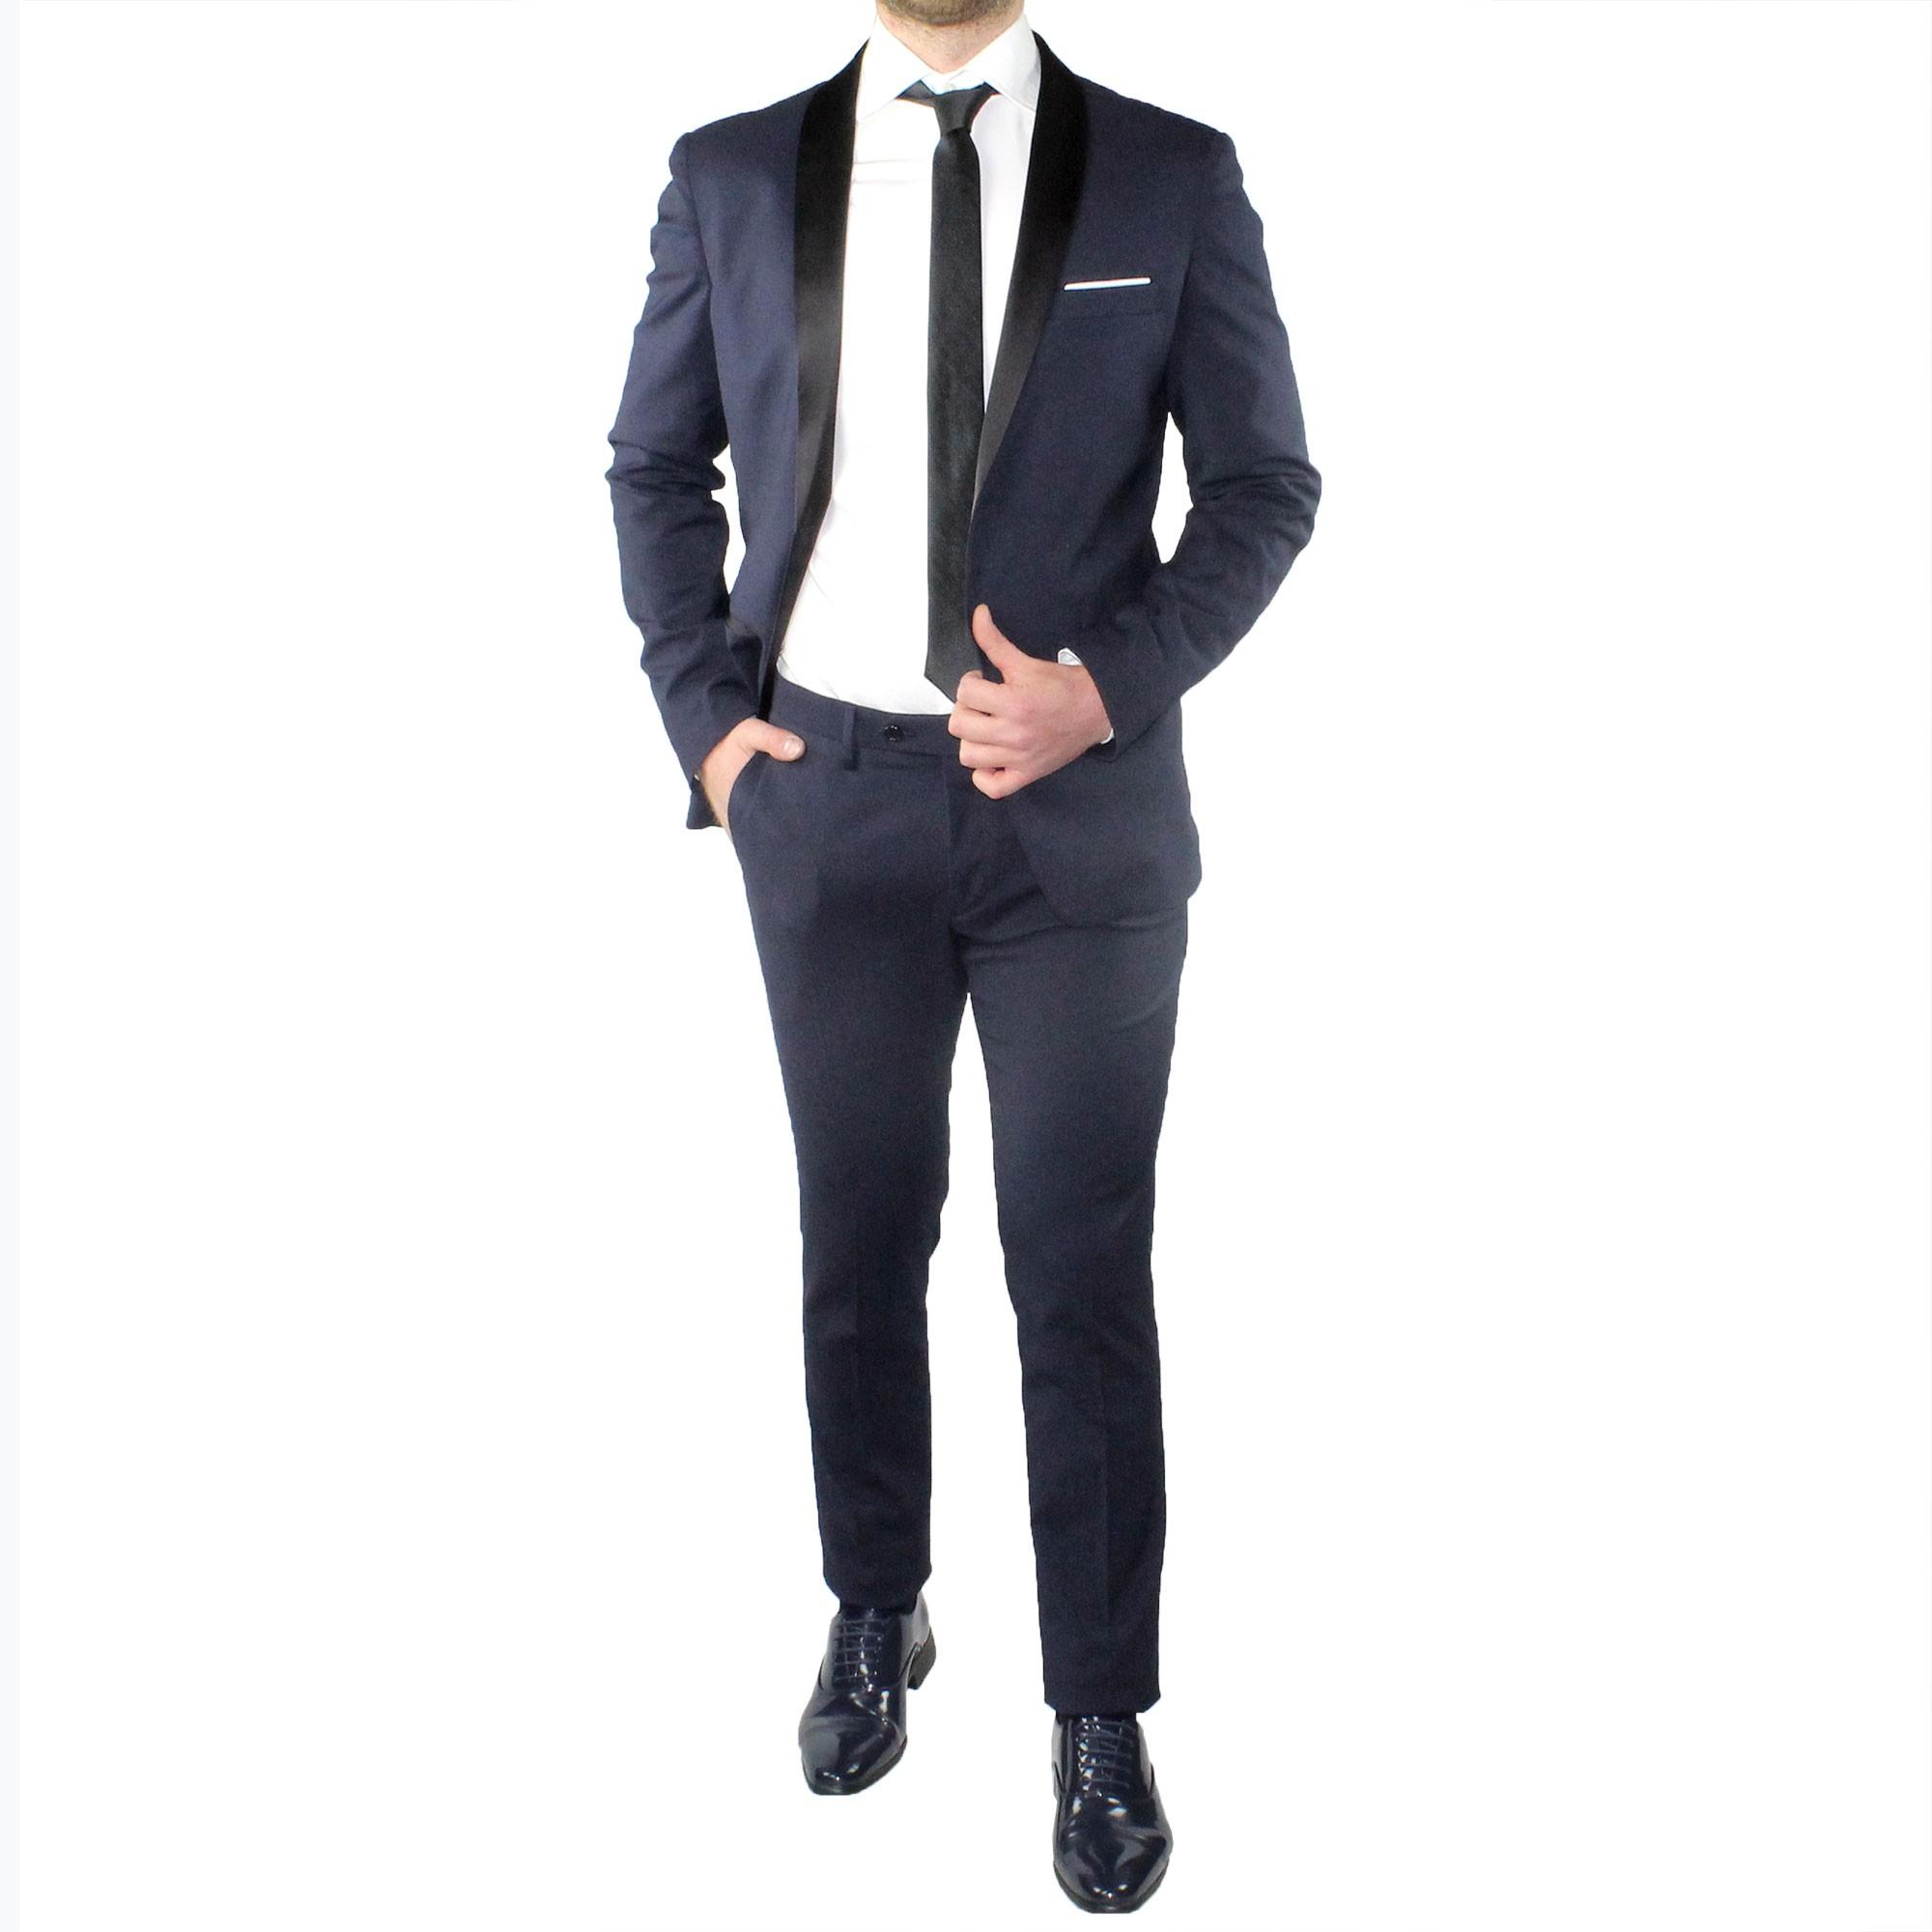 Dettagli su Abito Uomo Smoking Elegante Blu Vestito Completo Estivo Cerimonia Sartoriale